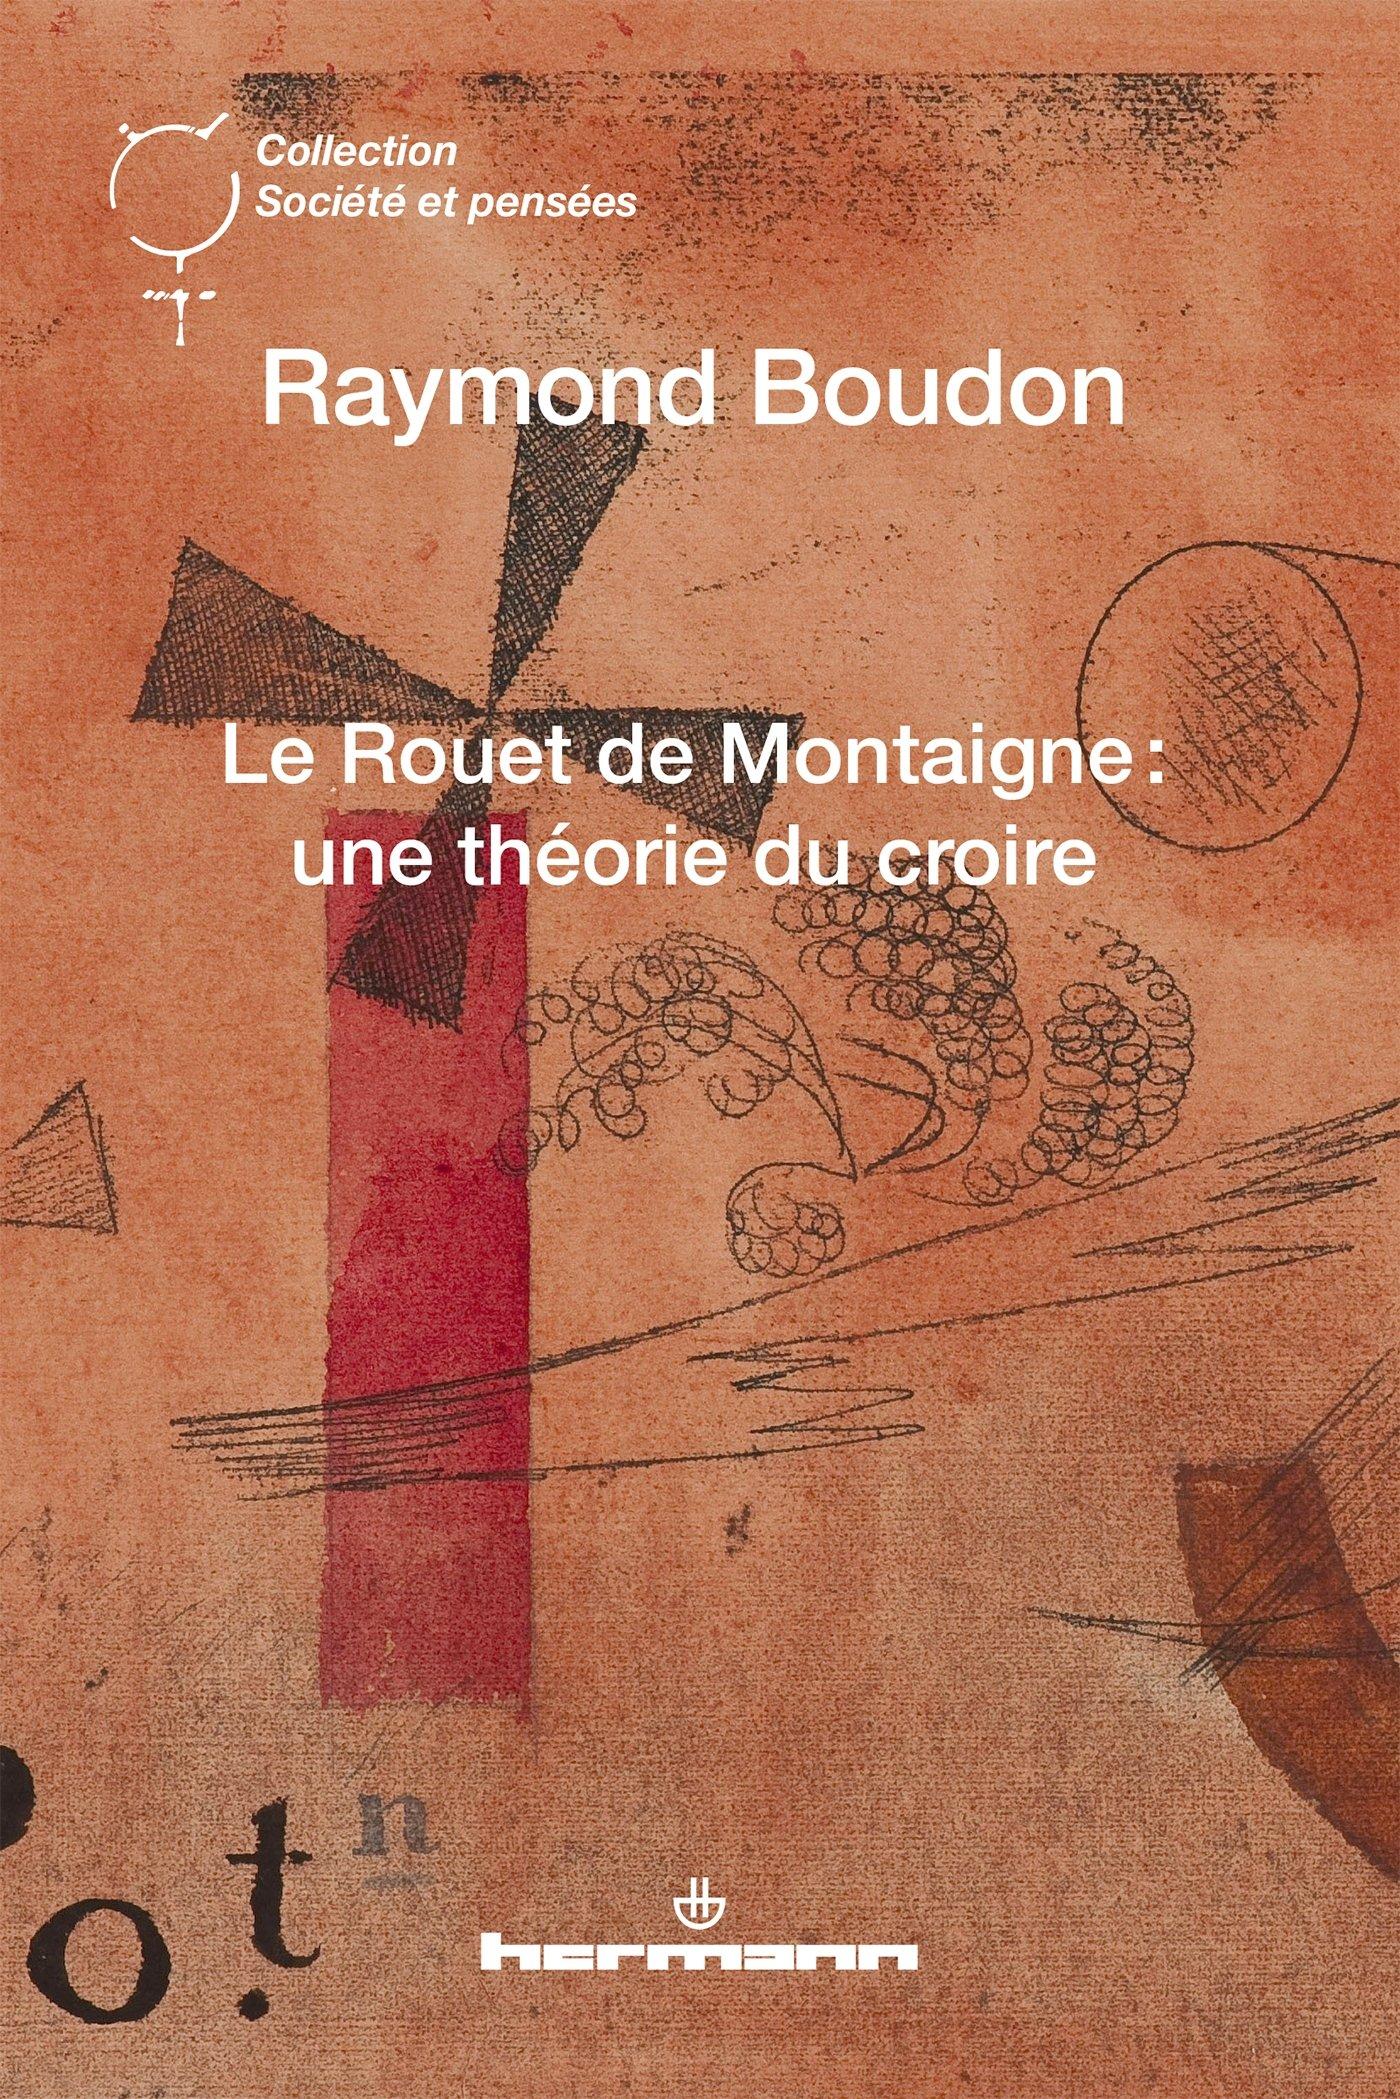 Le Rouet de Montaigne - Raymond Boudon